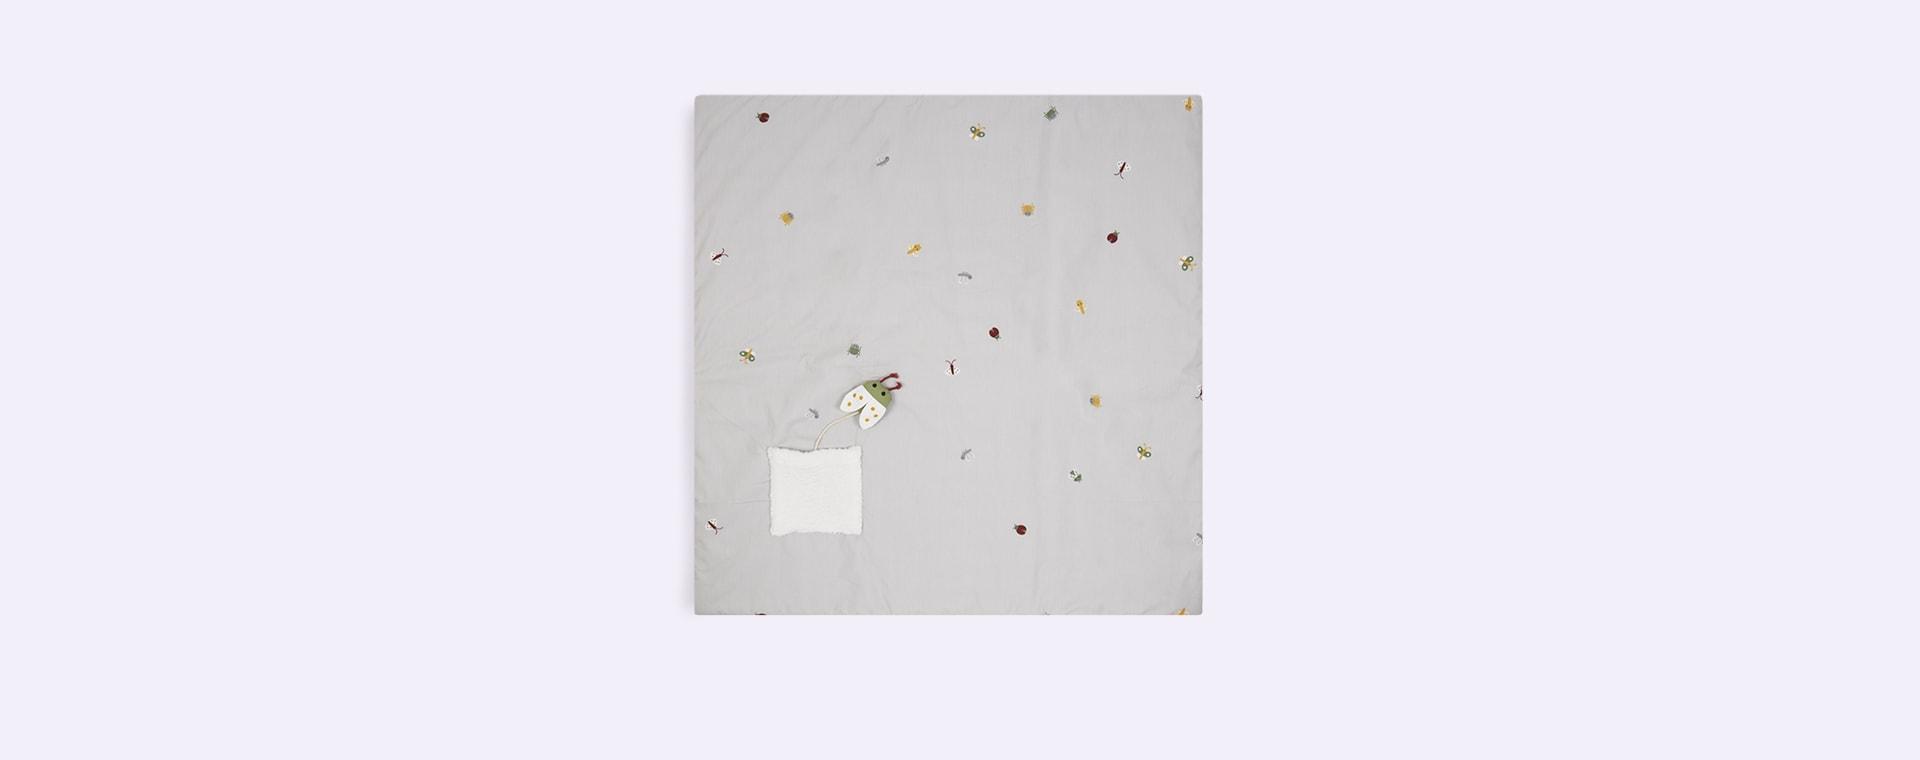 Grey Franck & Fischer Pusling Bug Playmat